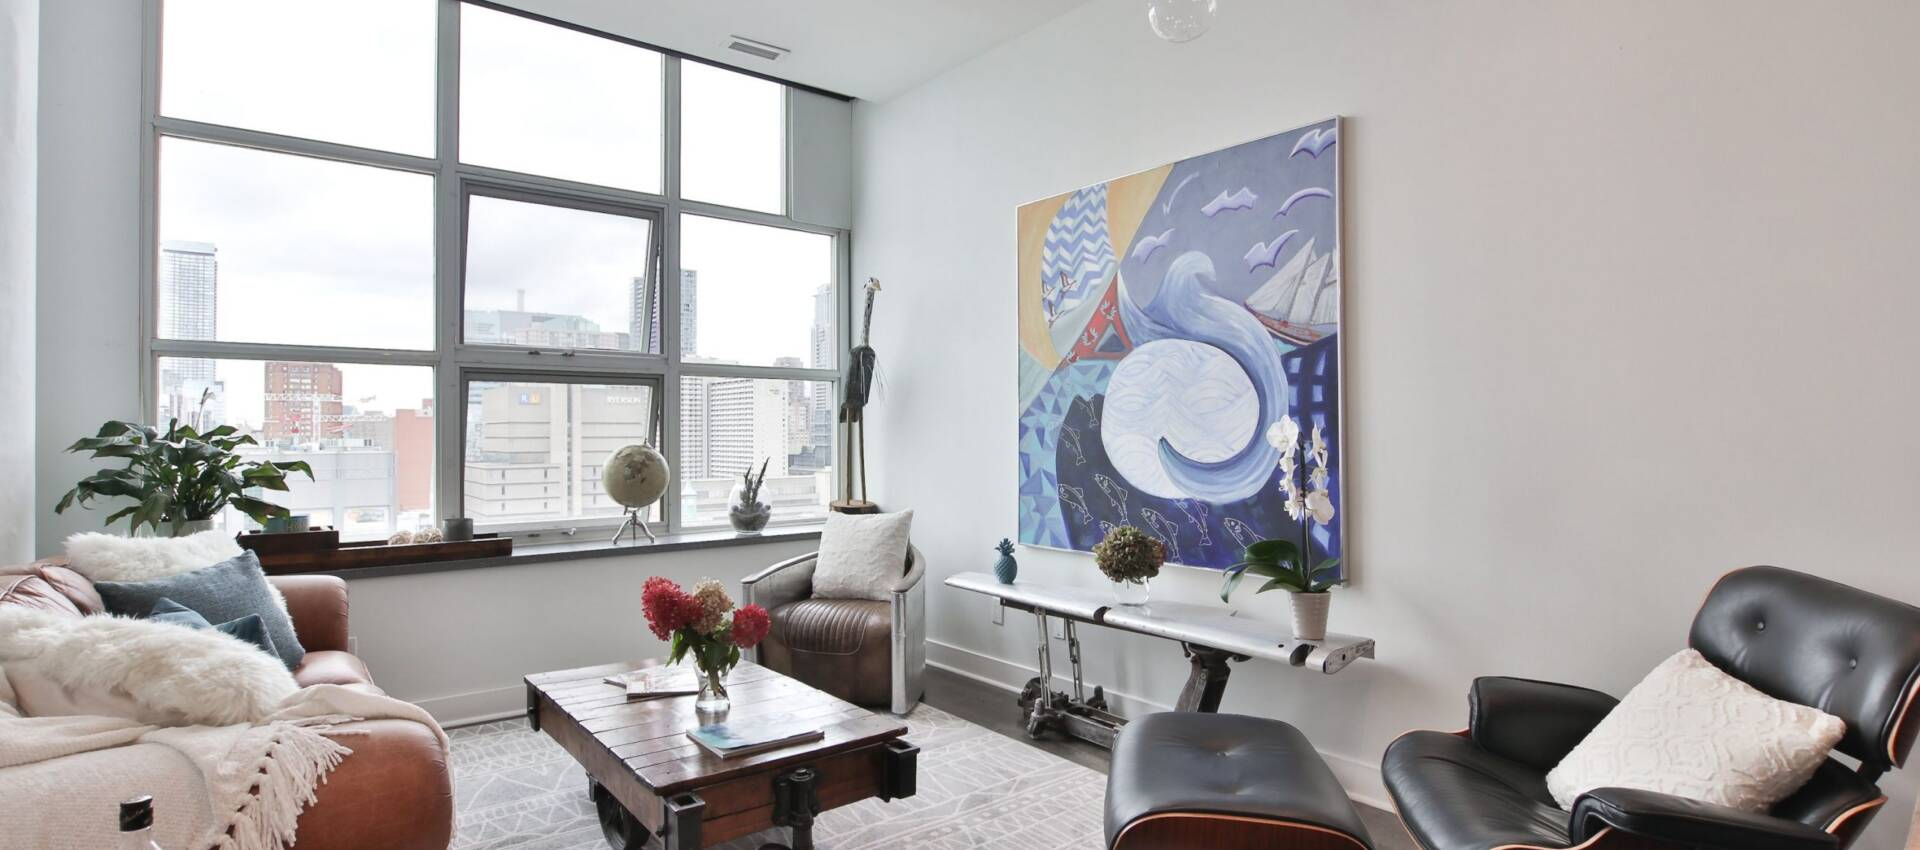 modern condo renovation with floor carpet - condo renovation toronto